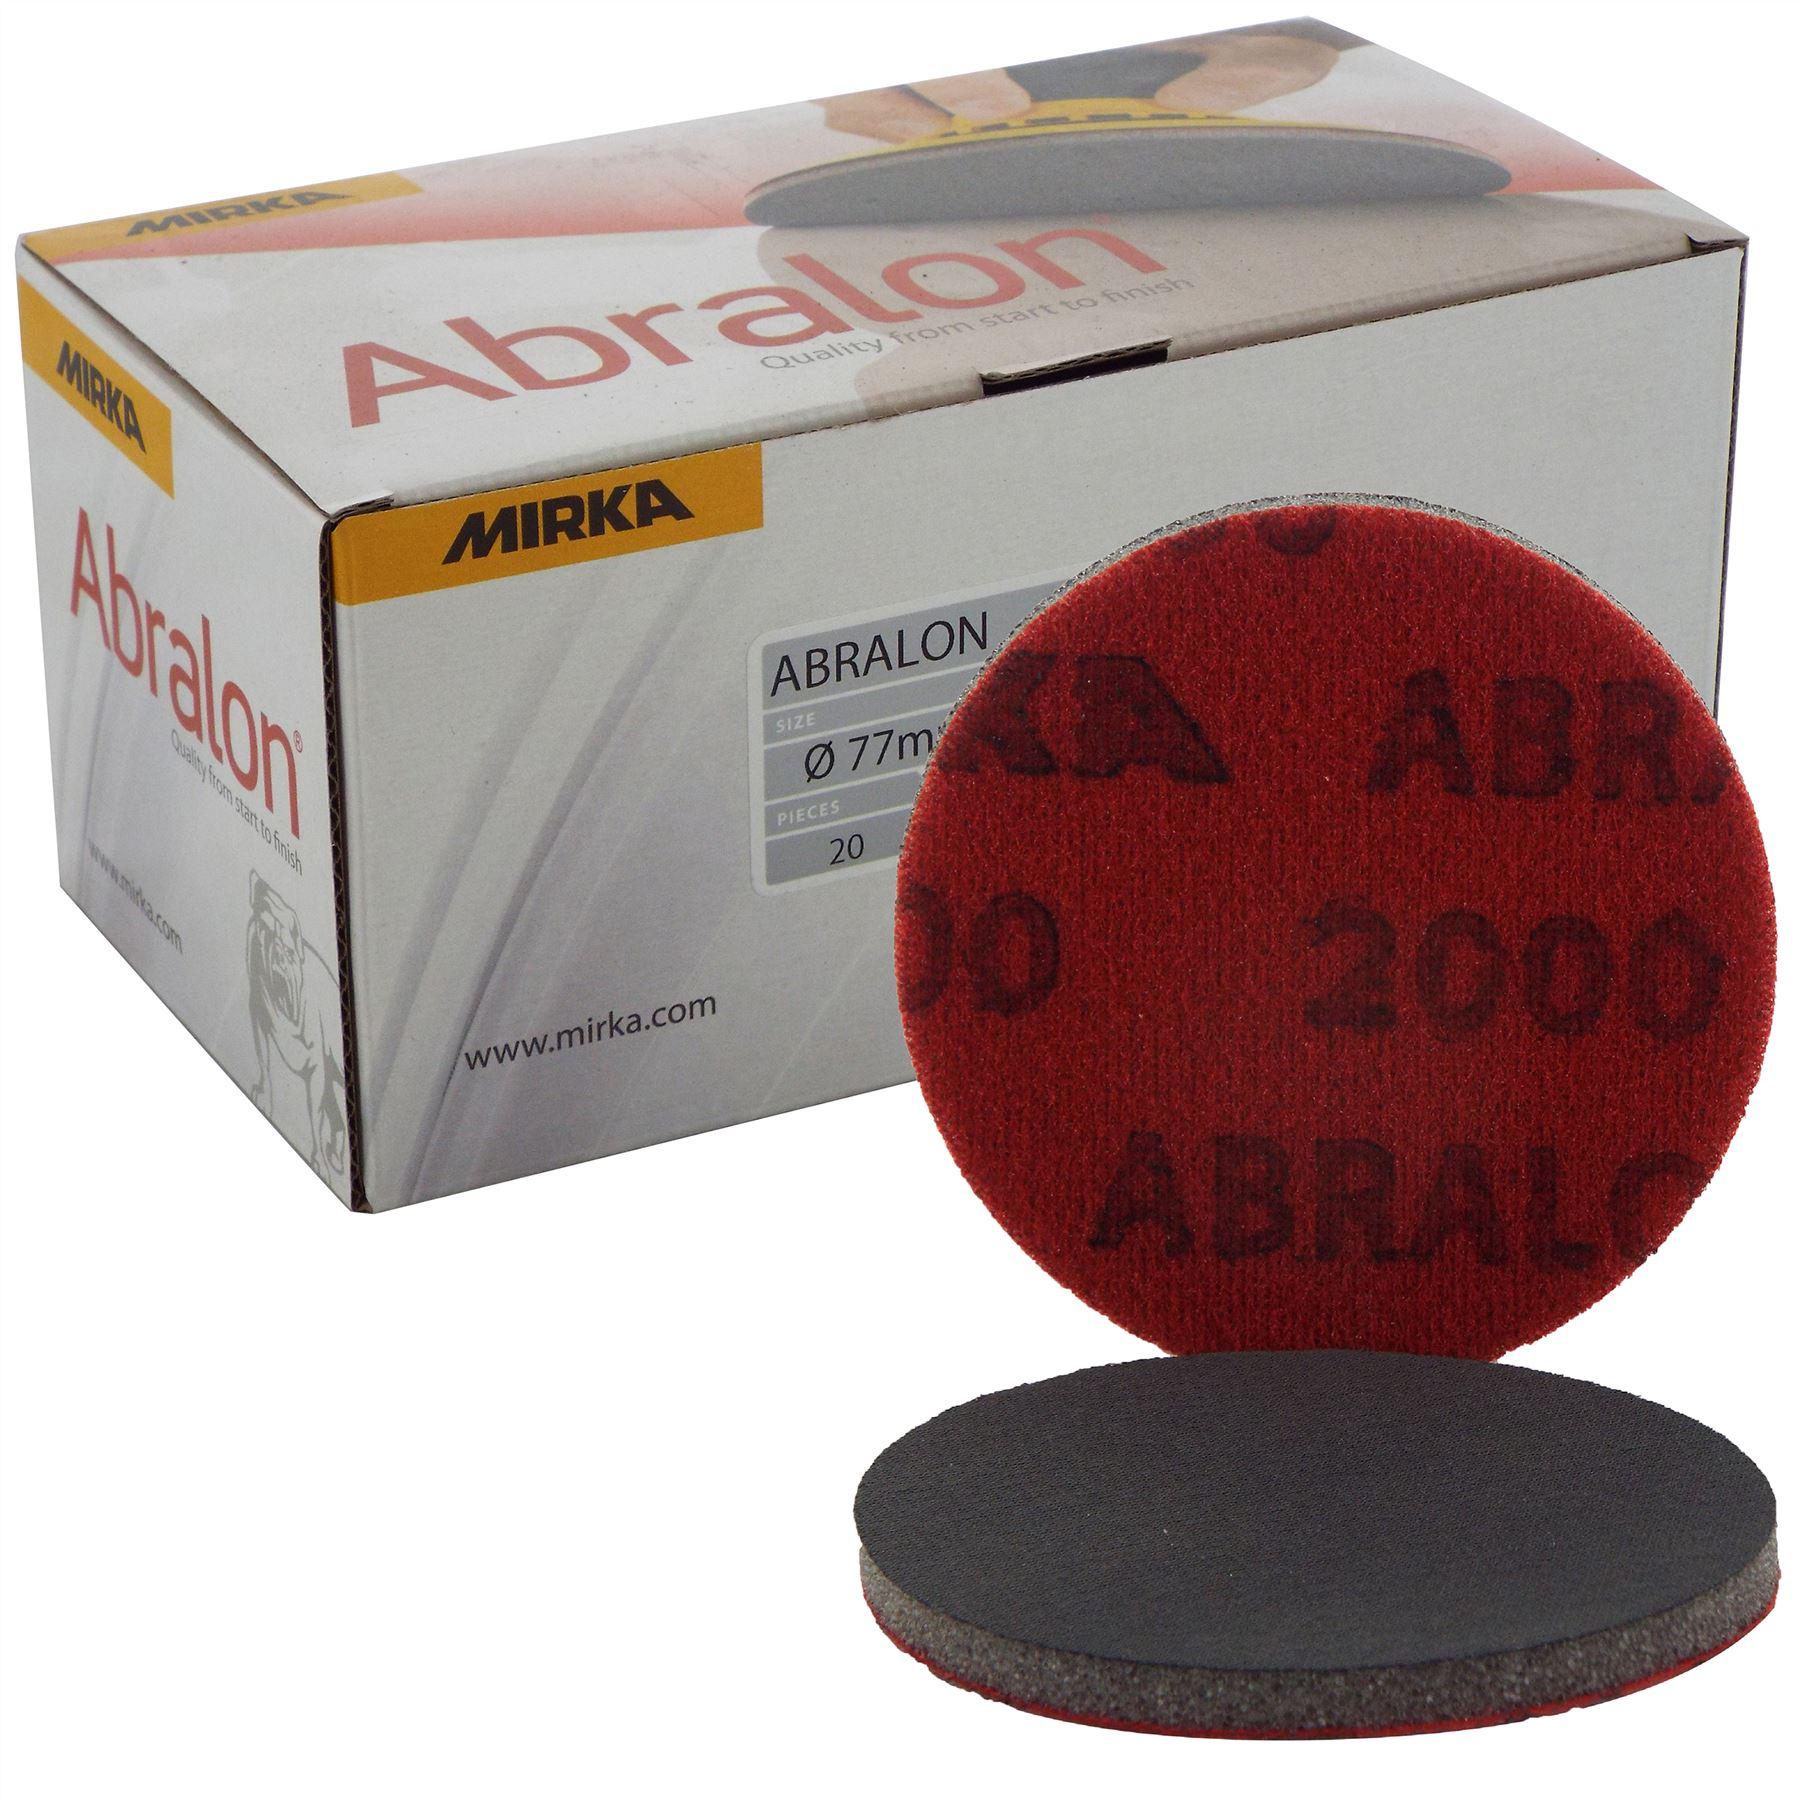 "All Grits Pack Of 2 Discs Mirka Abralon Abrasive Discs 150mm 6/"""